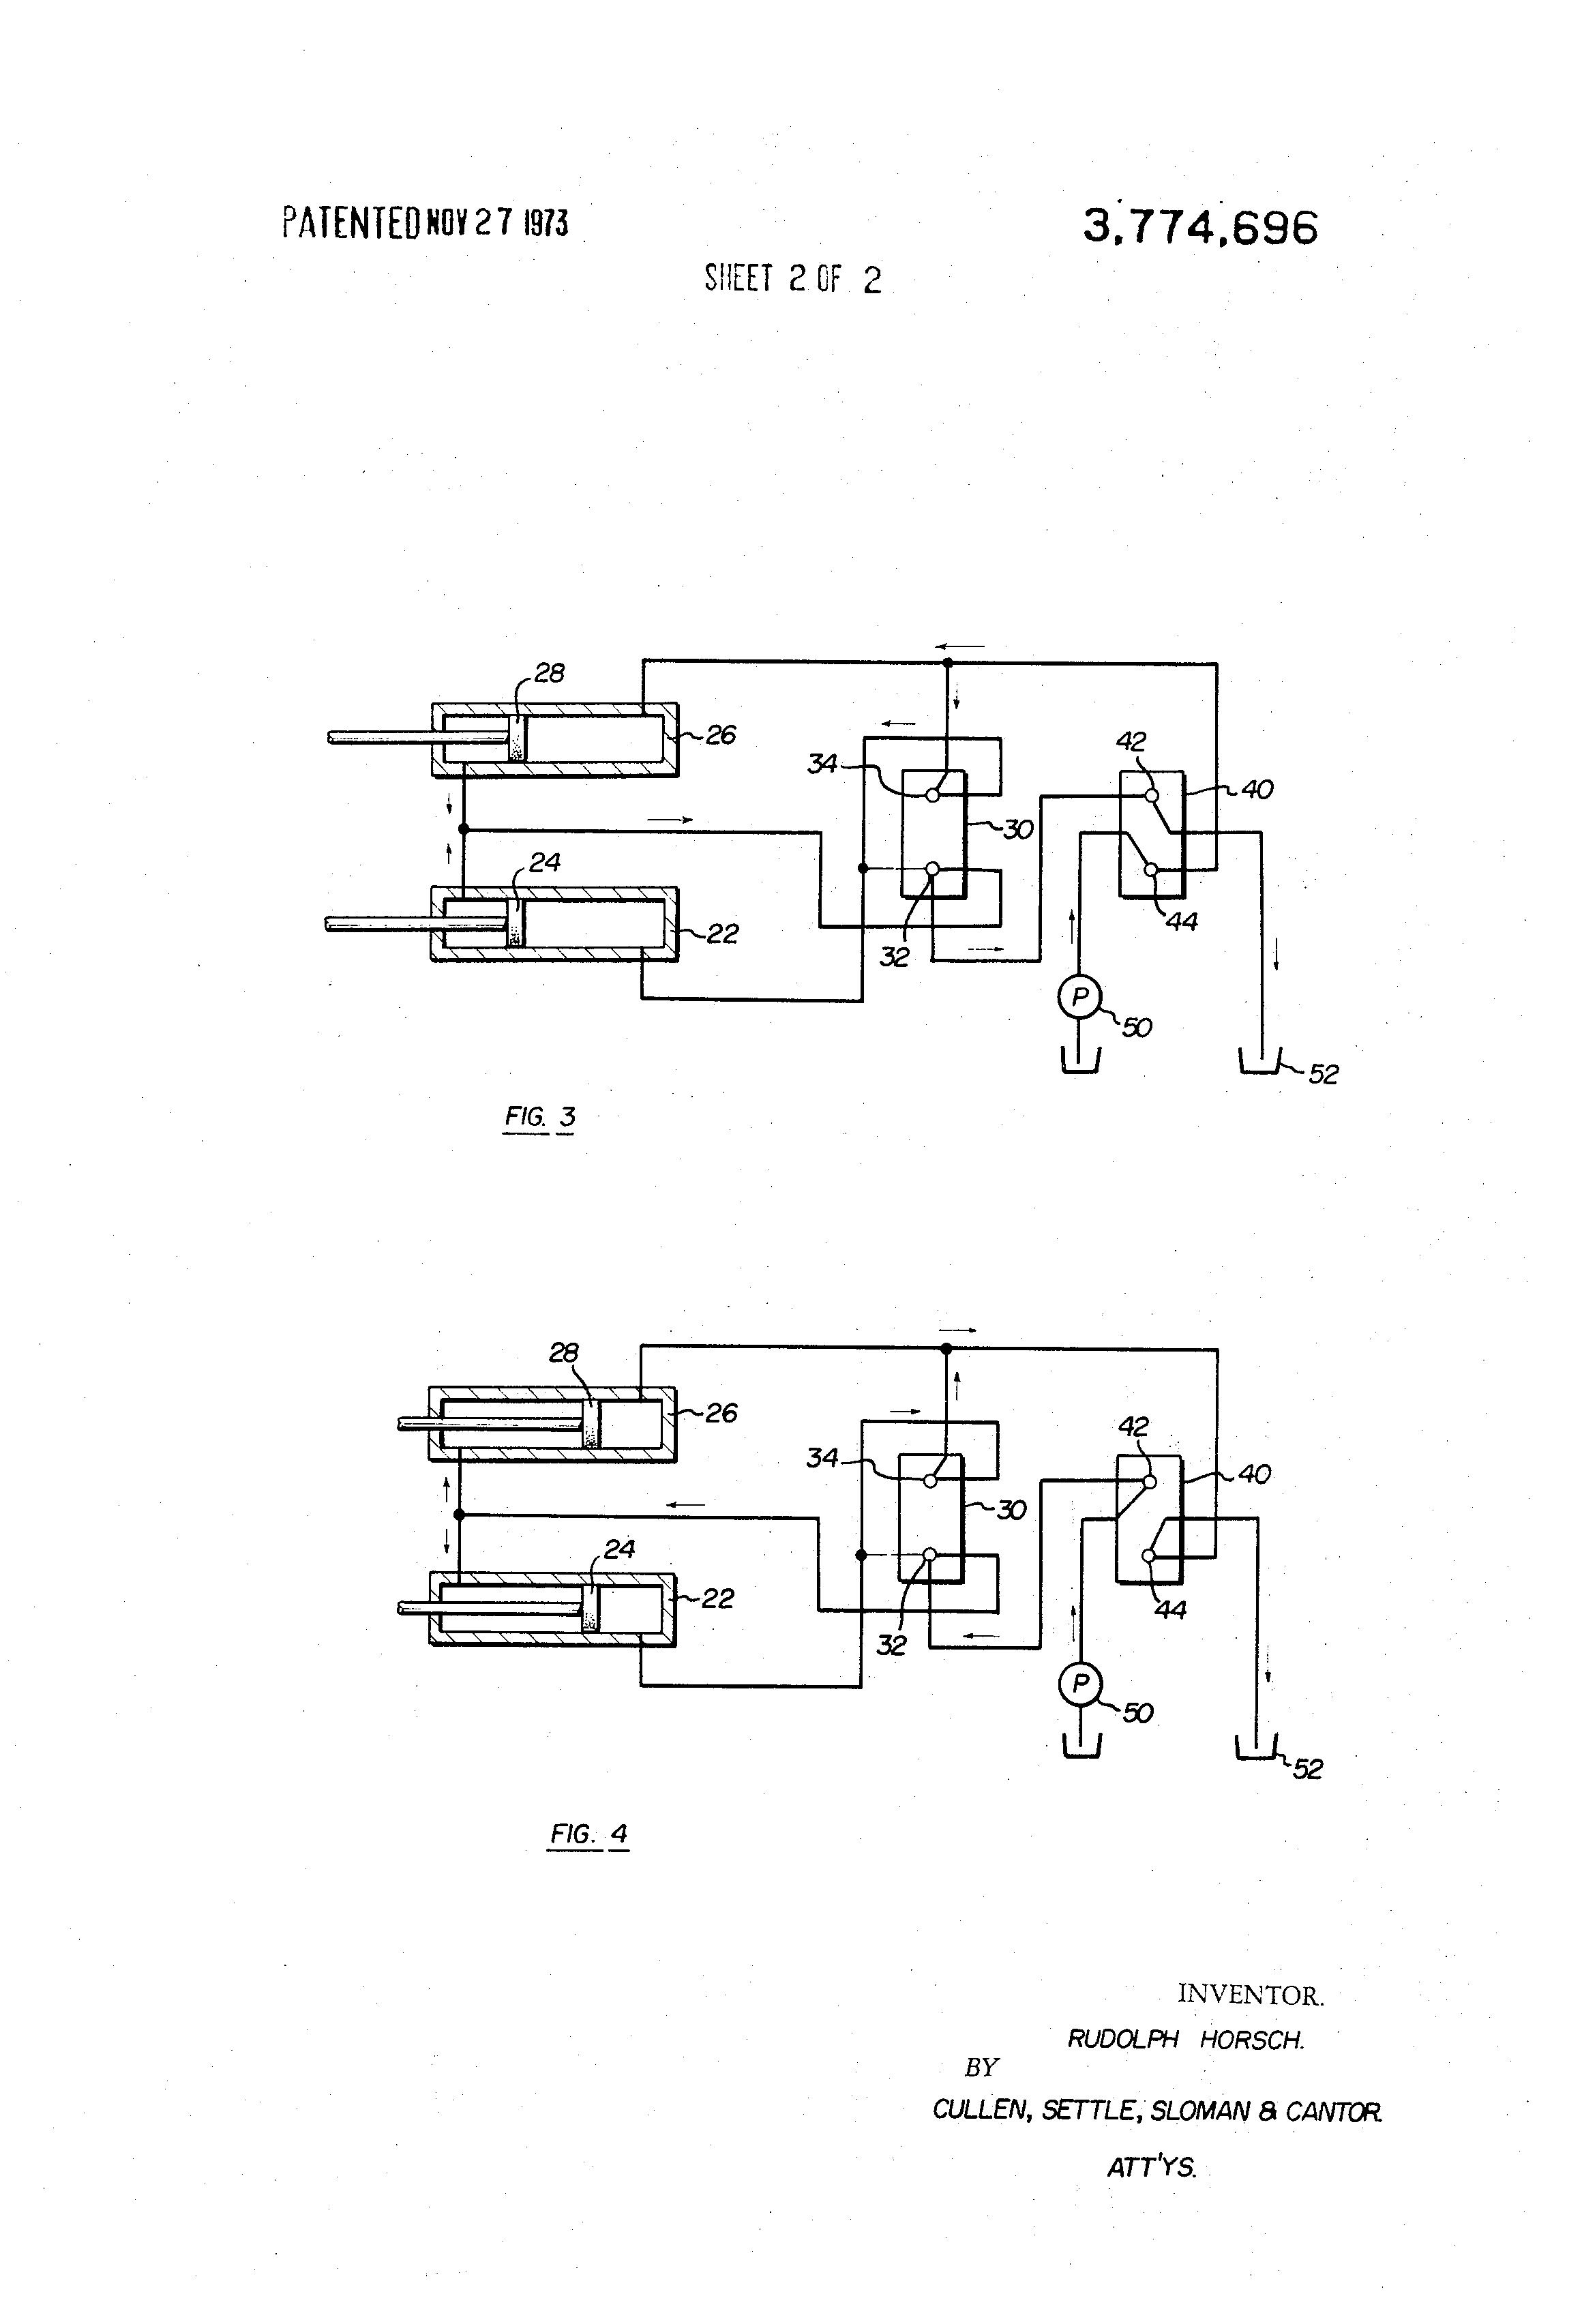 Dozer Hydraulic System Schematic Automotive Wiring Diagram Basic Simple Brevet Us3774696 Pitch Tilt Circuits For Blades Rh Google Dj